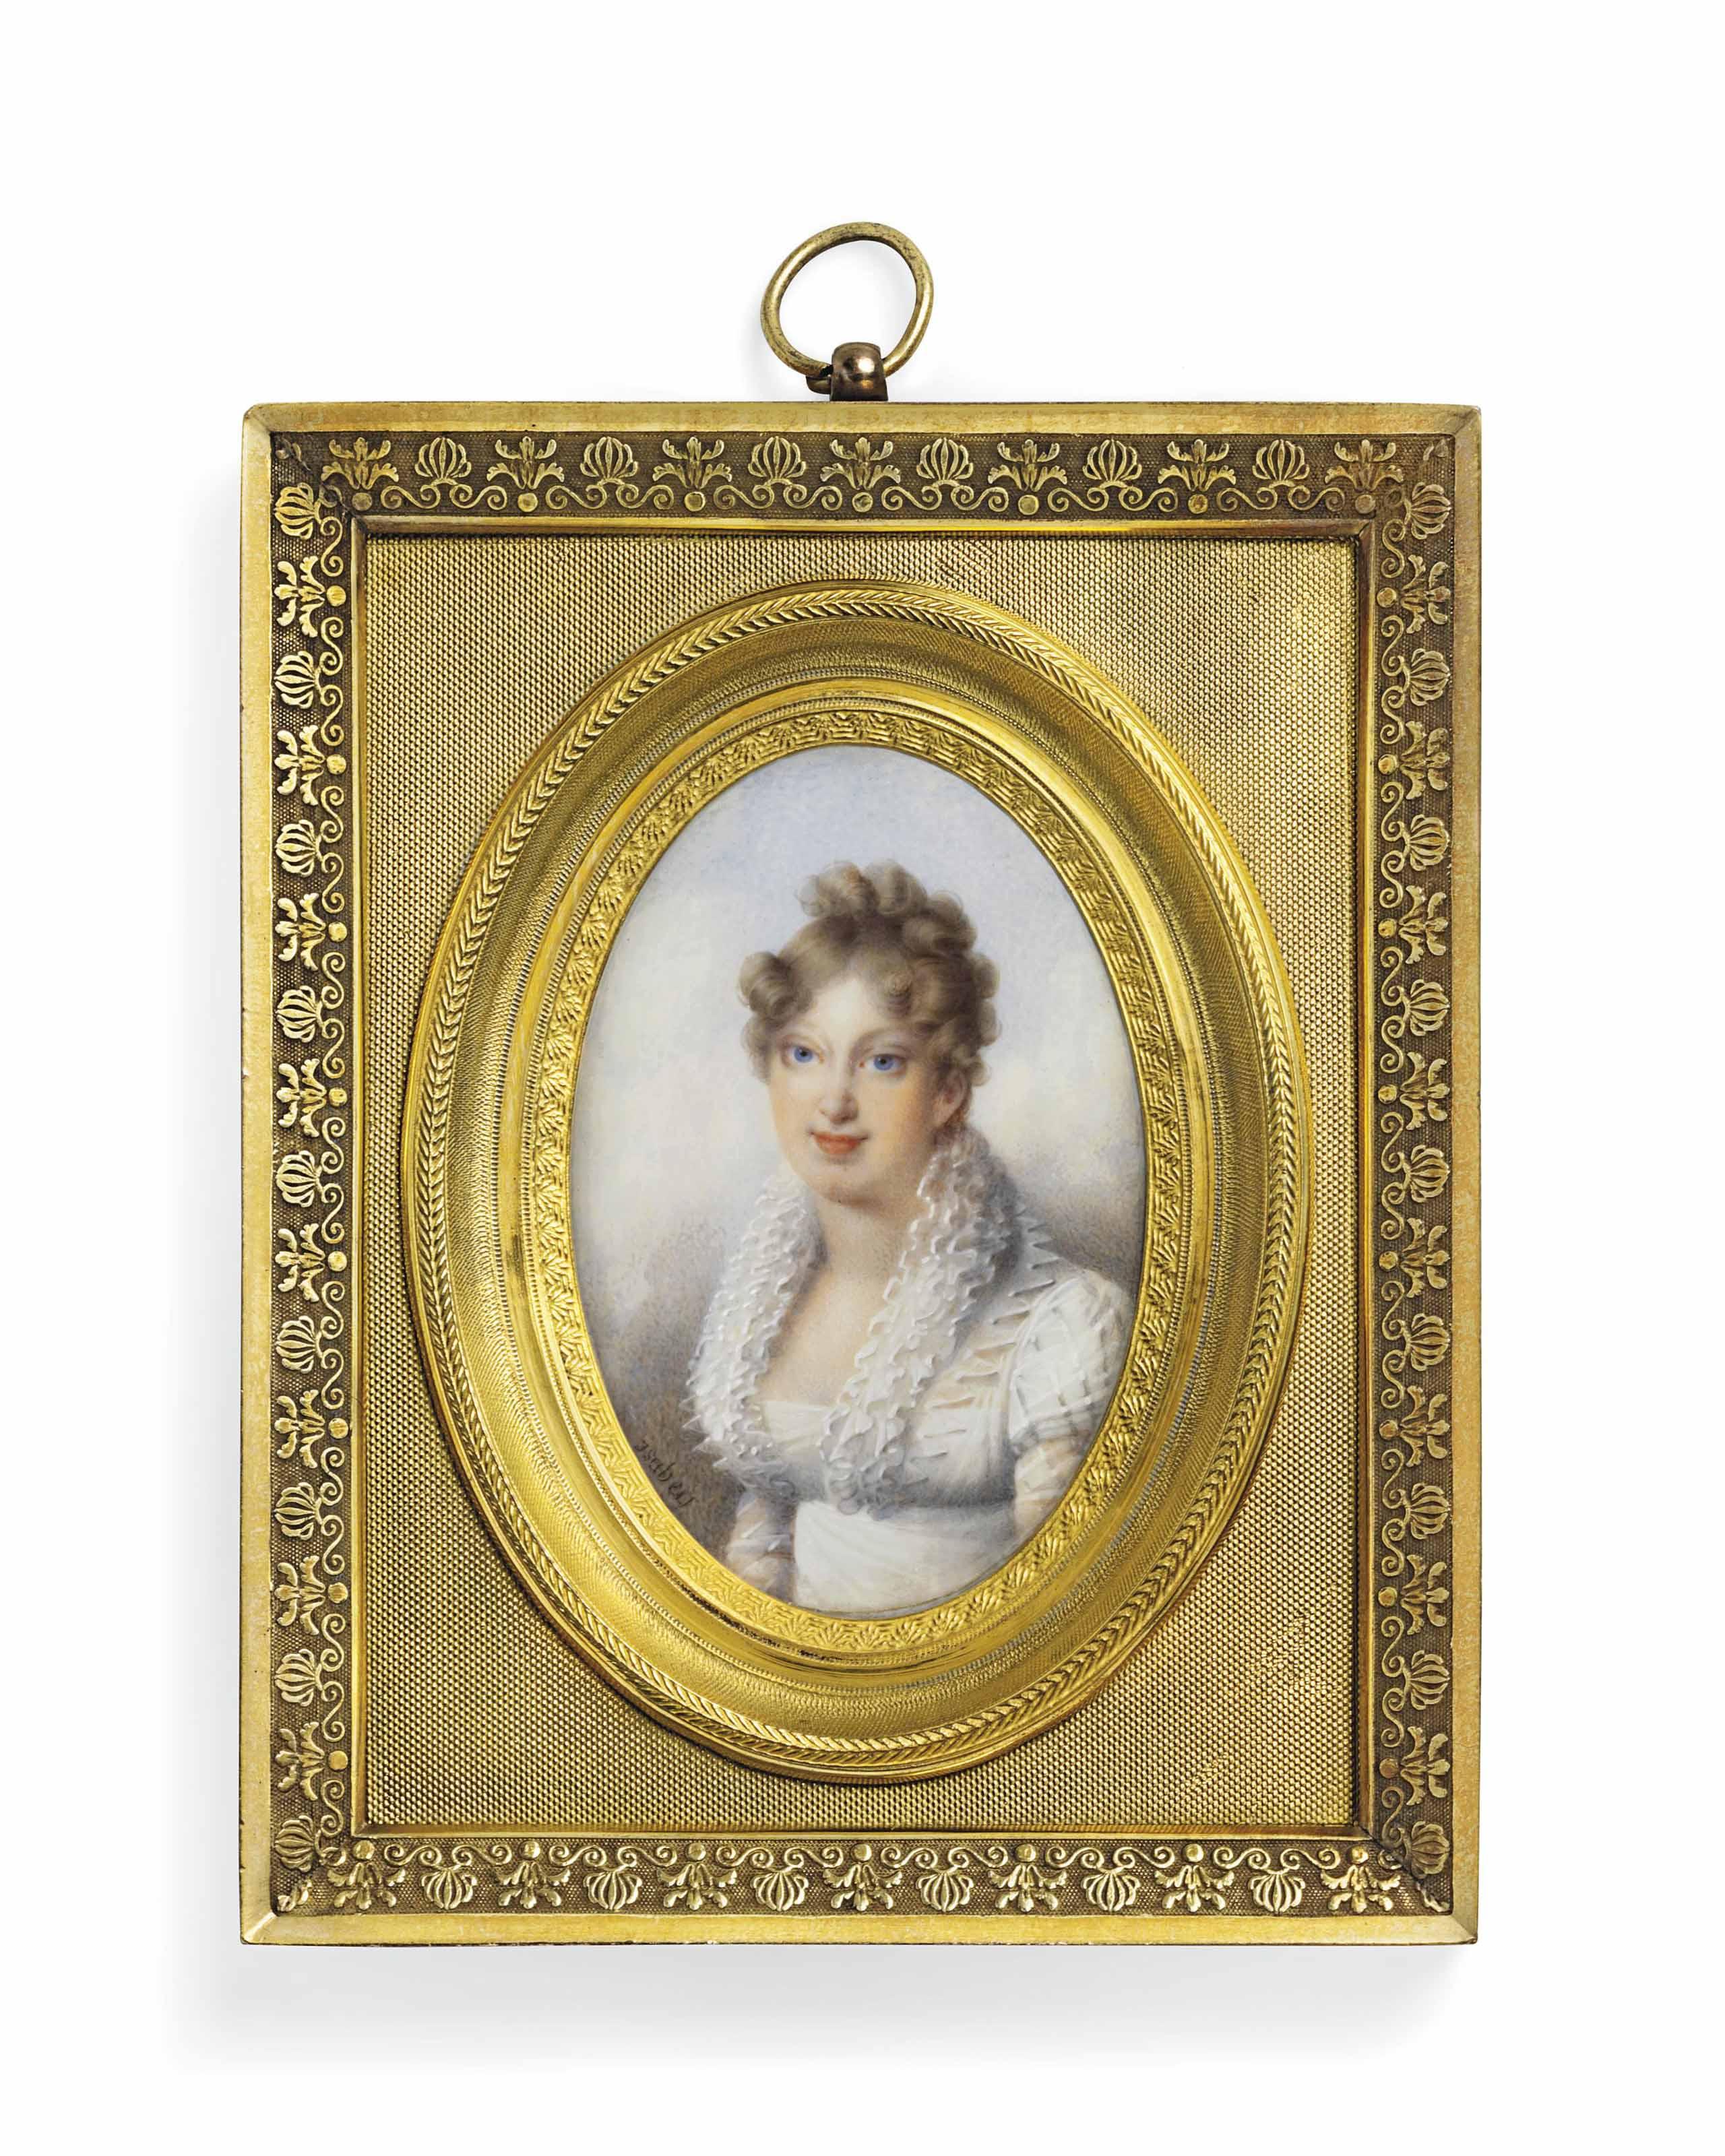 JEAN-PIERRE MENUISIER (FRENCH, B. 1783)